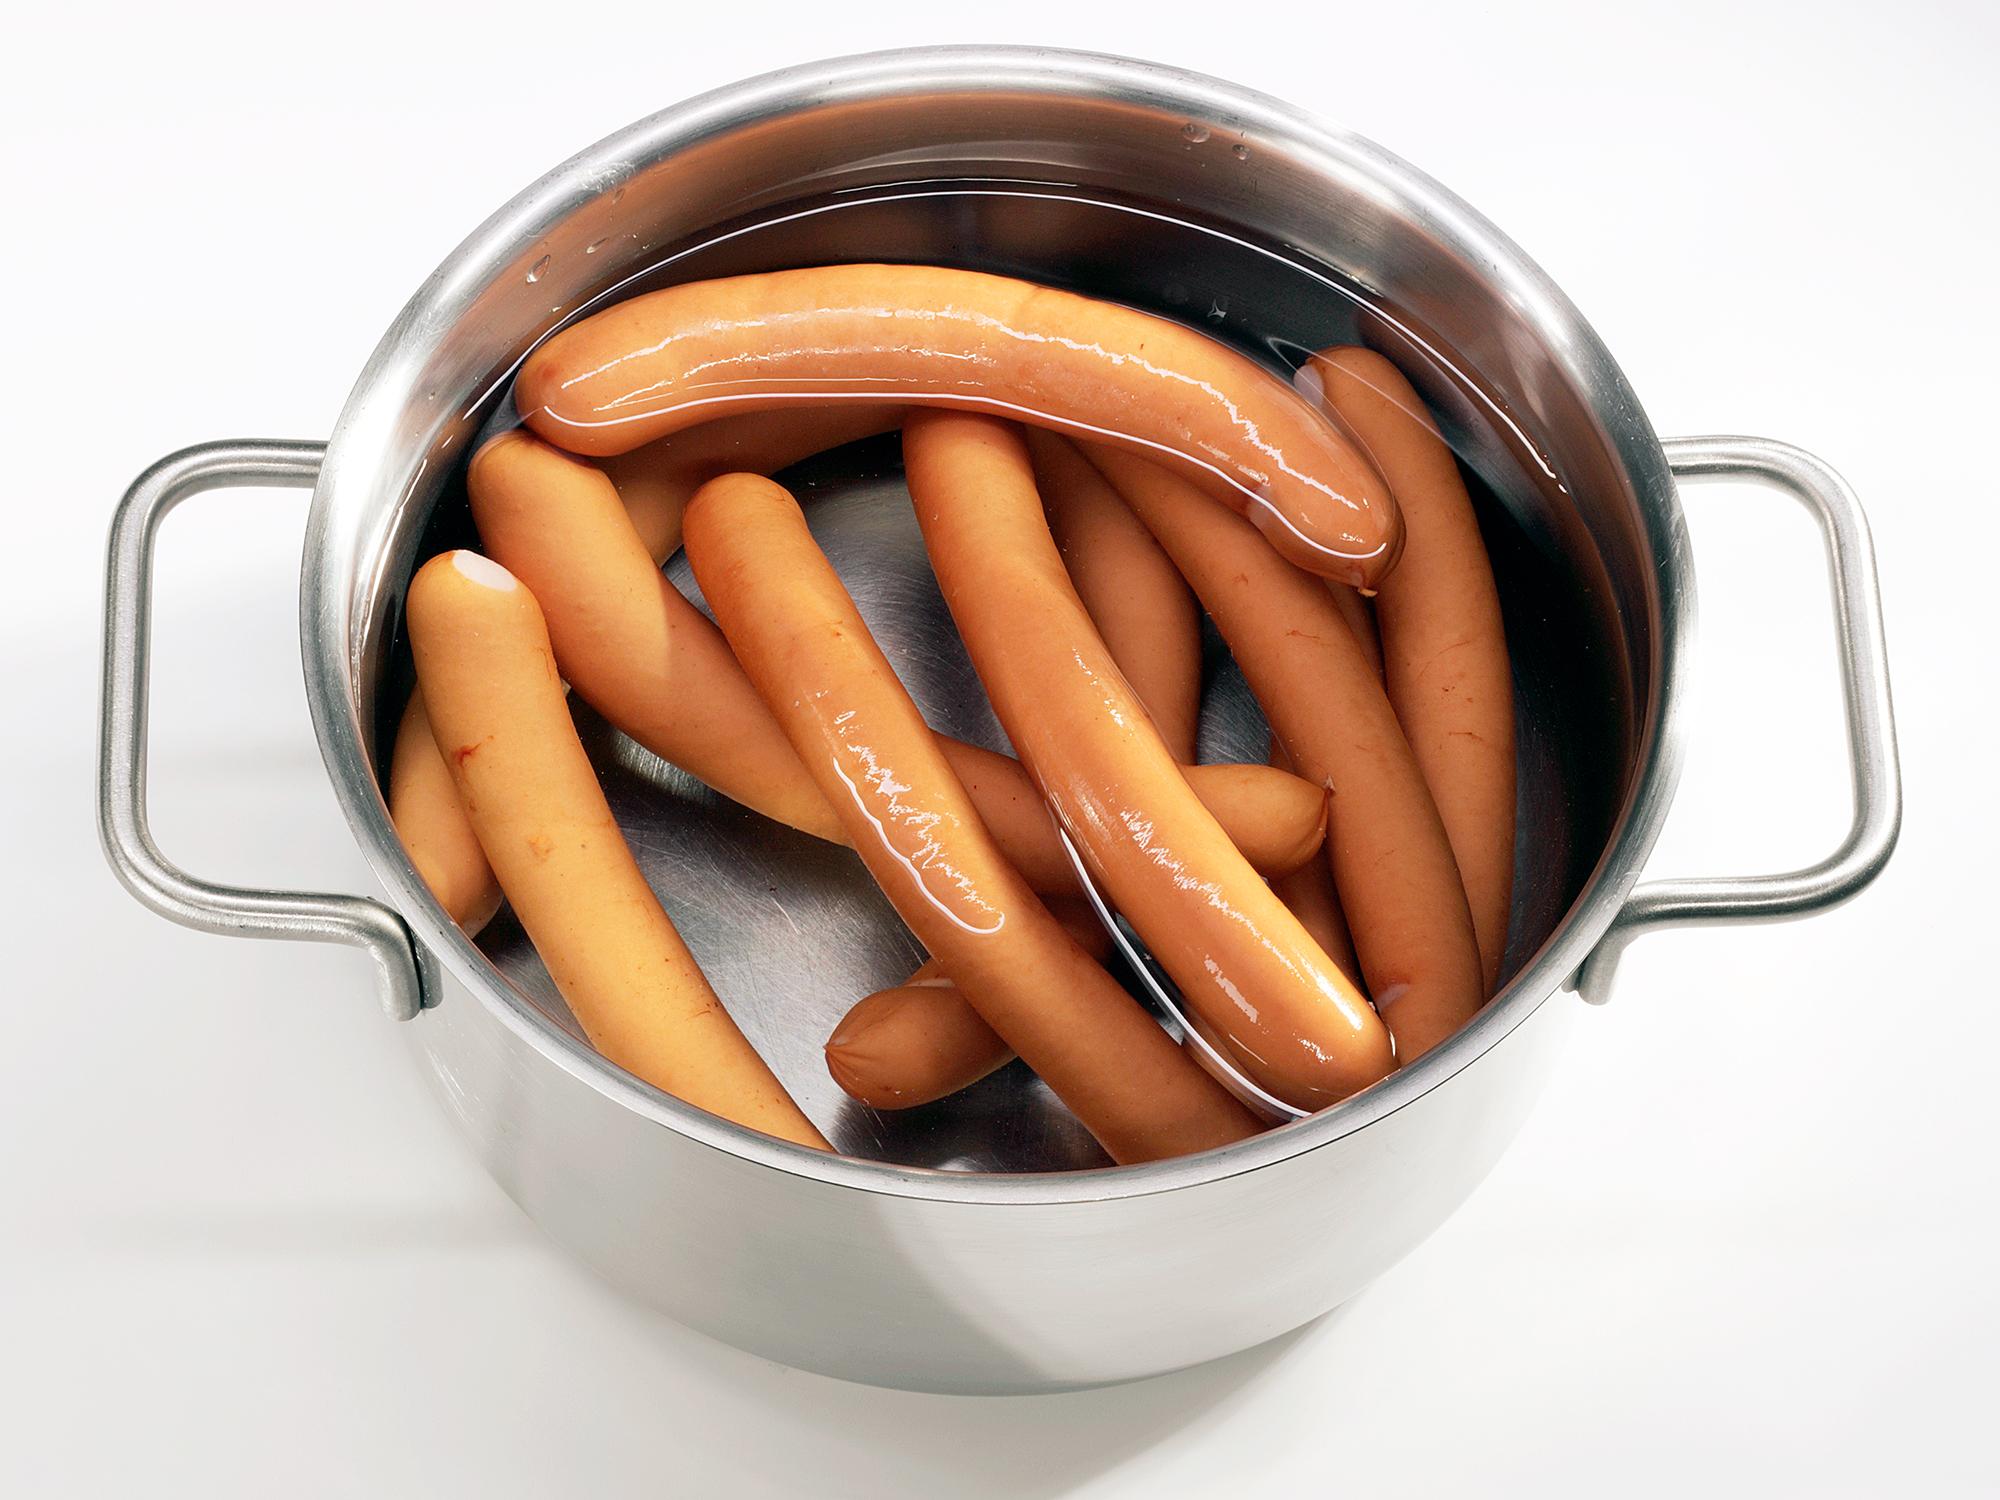 Hot dog water